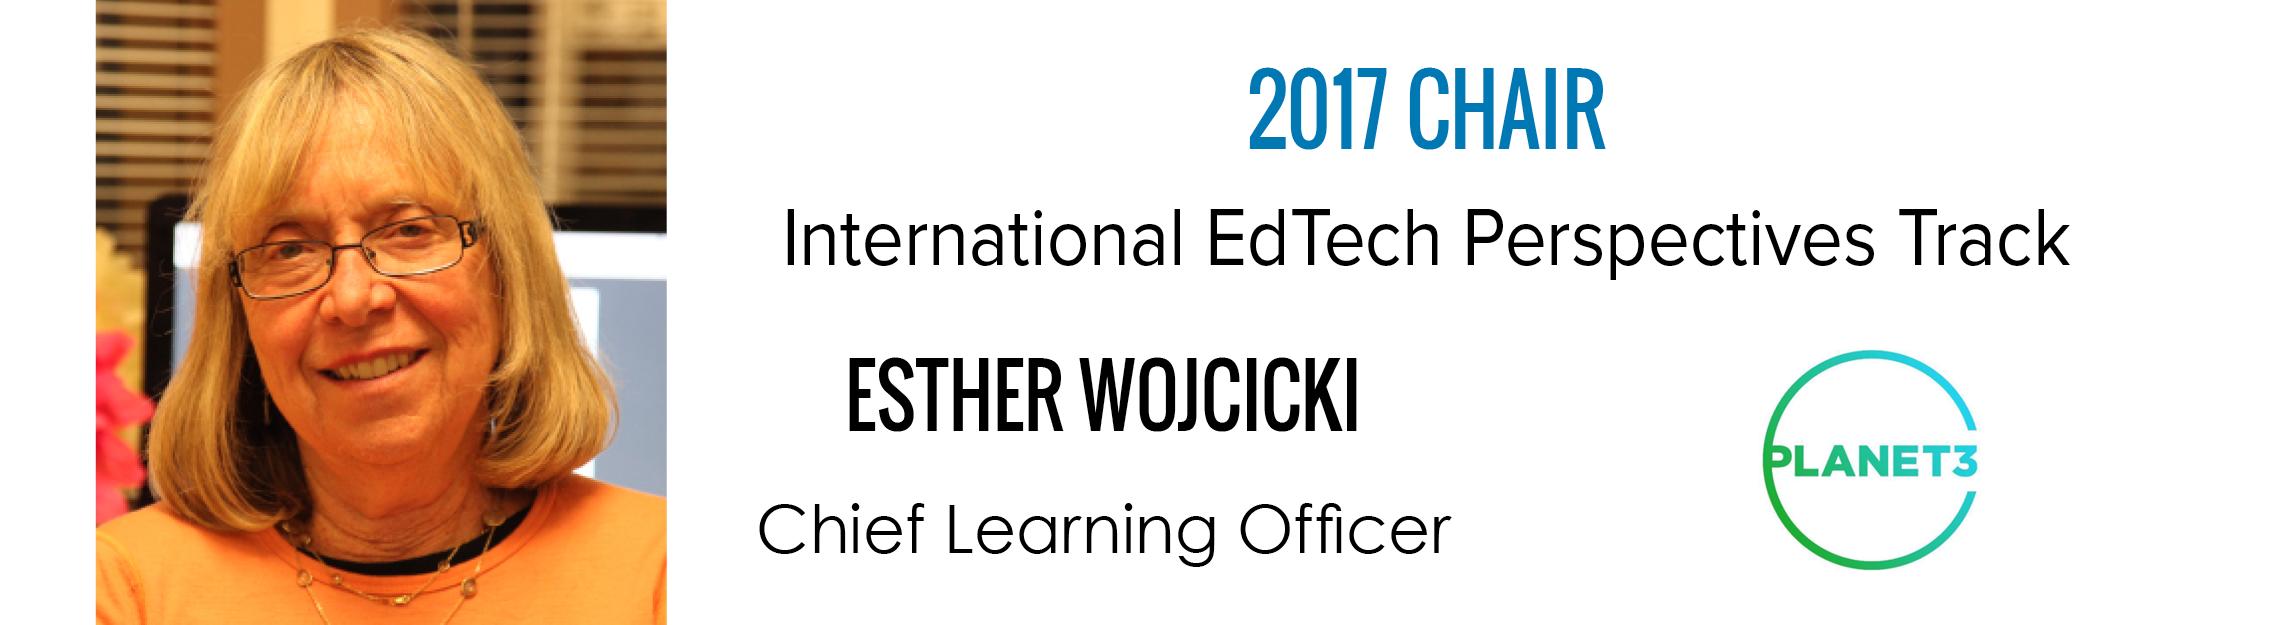 Esther - Chairman - International EdTech Perspectives- Chair.png